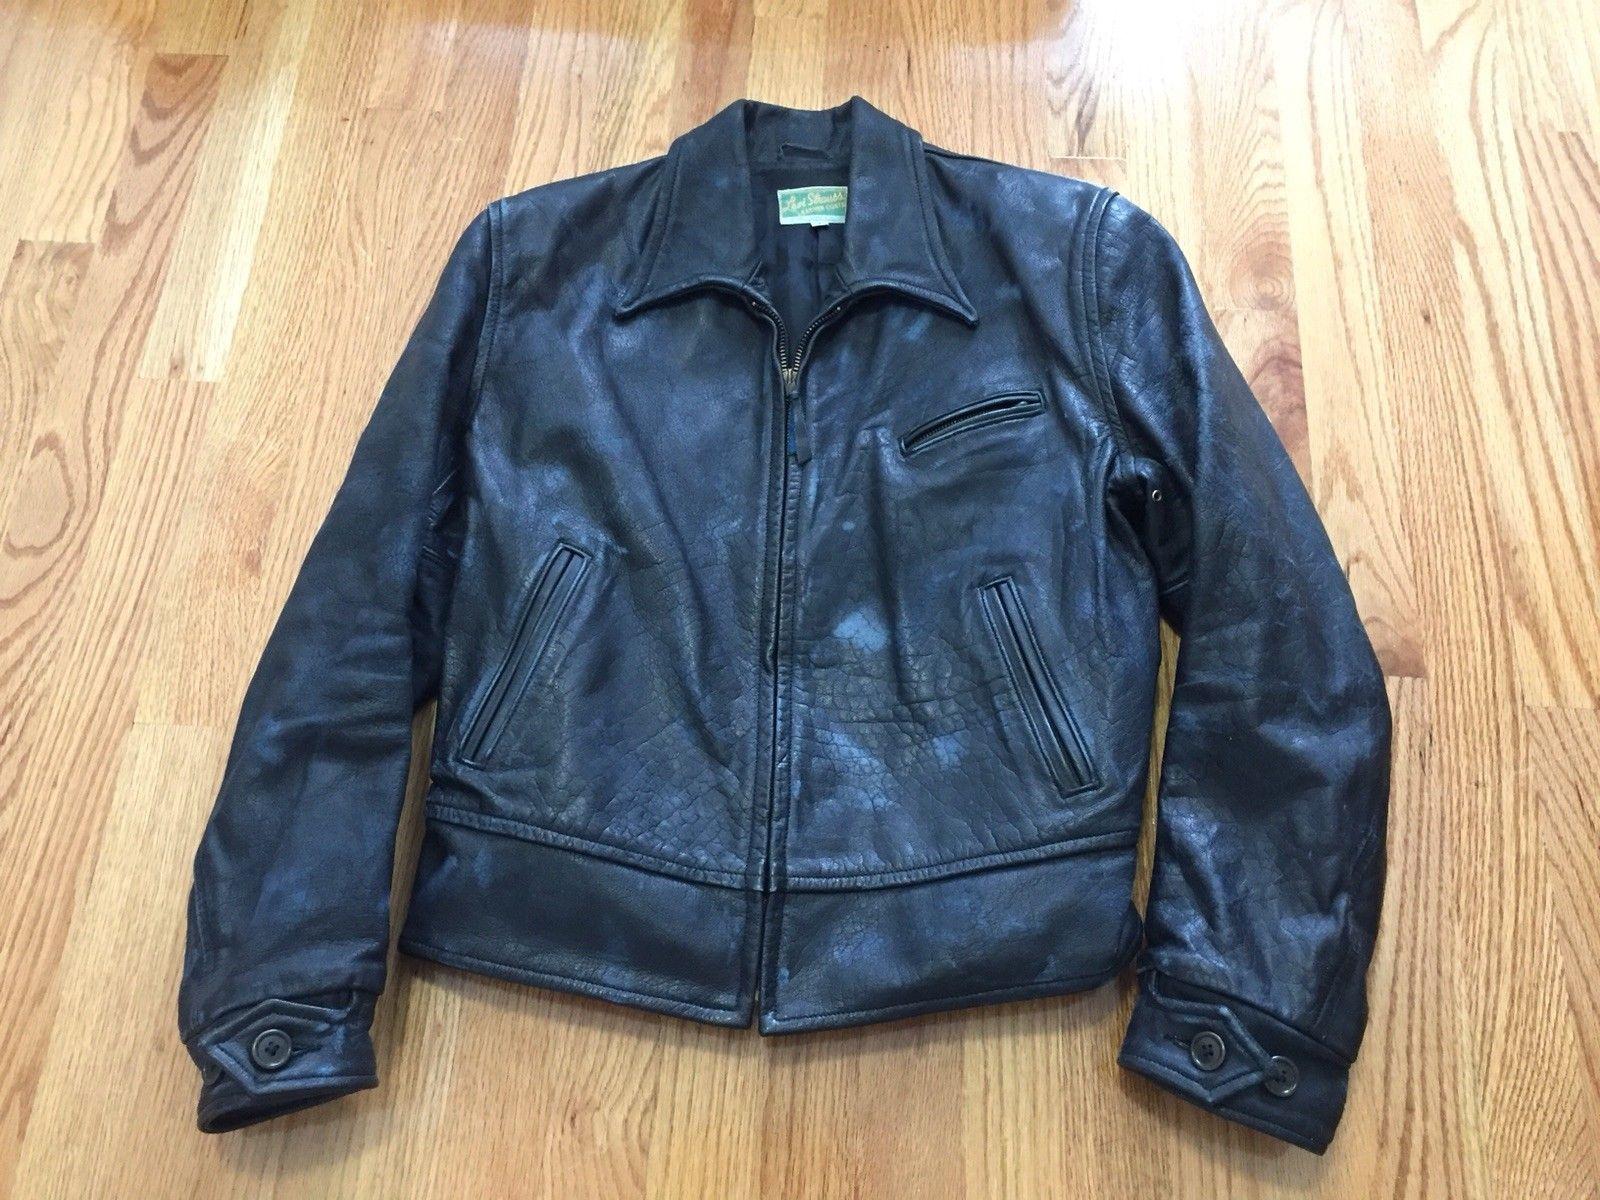 Rare Levi by Aero Scotland Leather jacket, Jackets